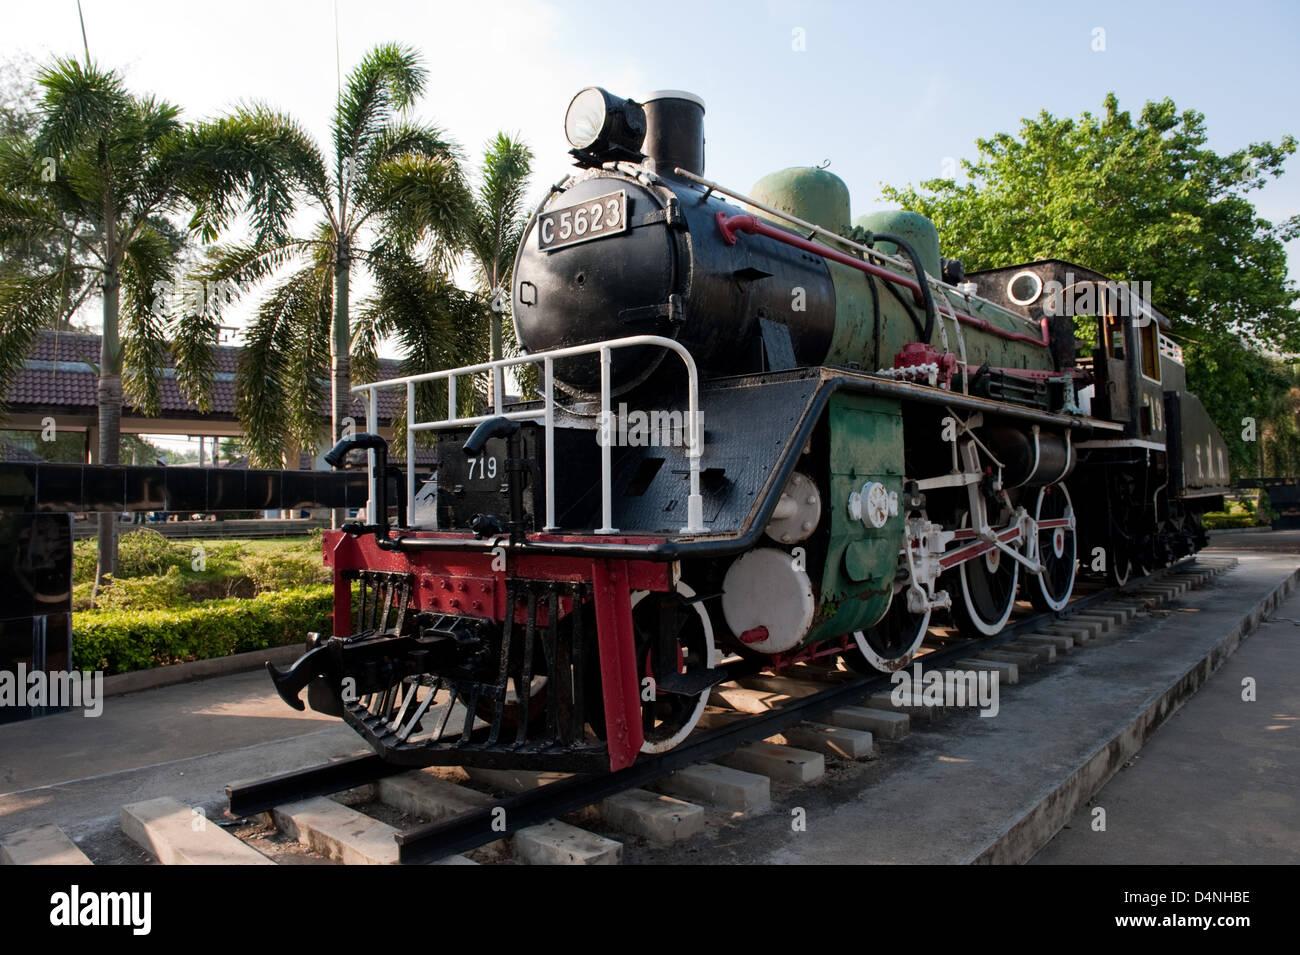 Kanchanaburi, Thailand, historical locomotive of the Thai-Burma Railway - Stock Image